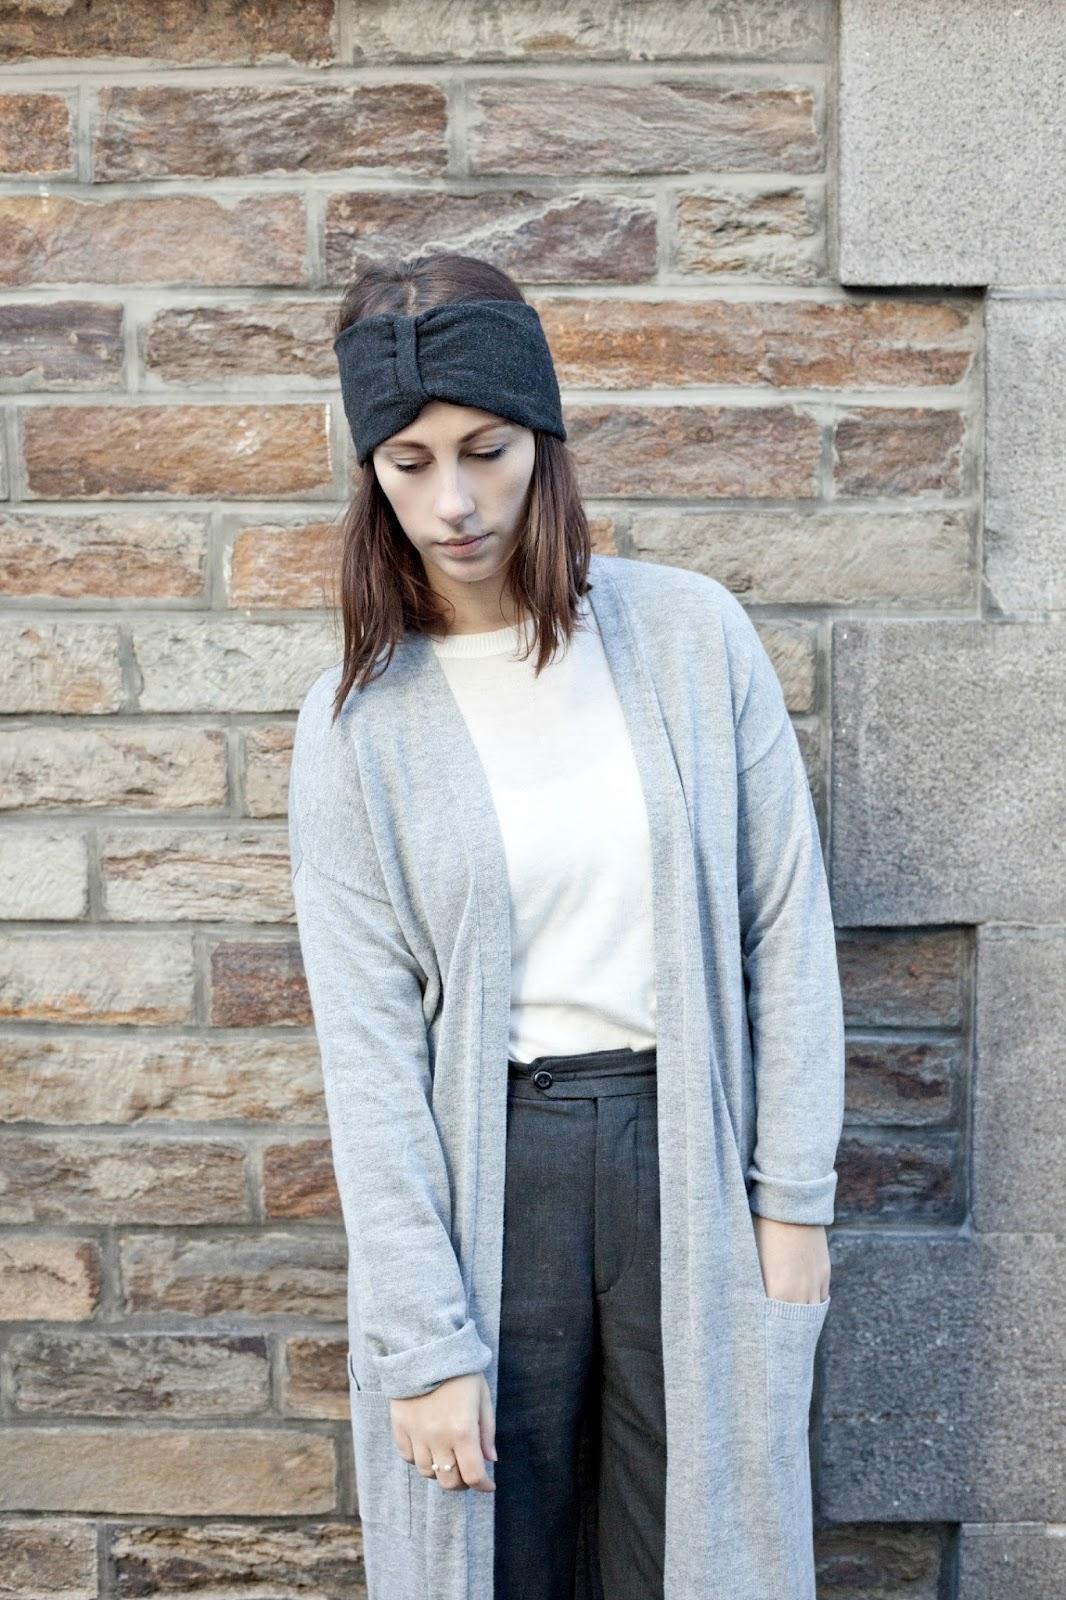 tendance 50 shade of grey